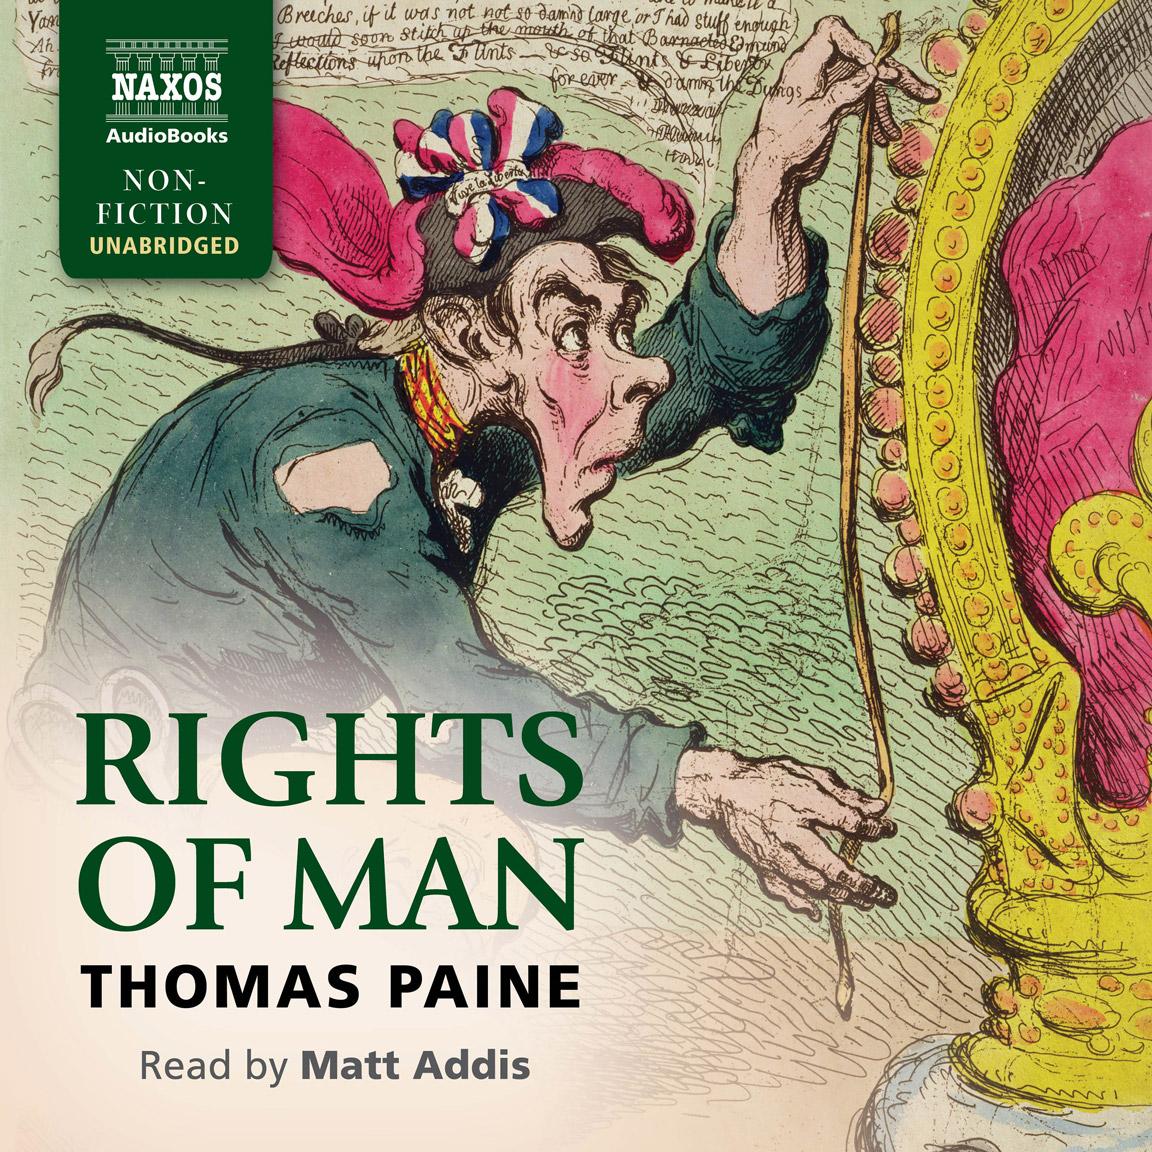 Rights of Man (unabridged)